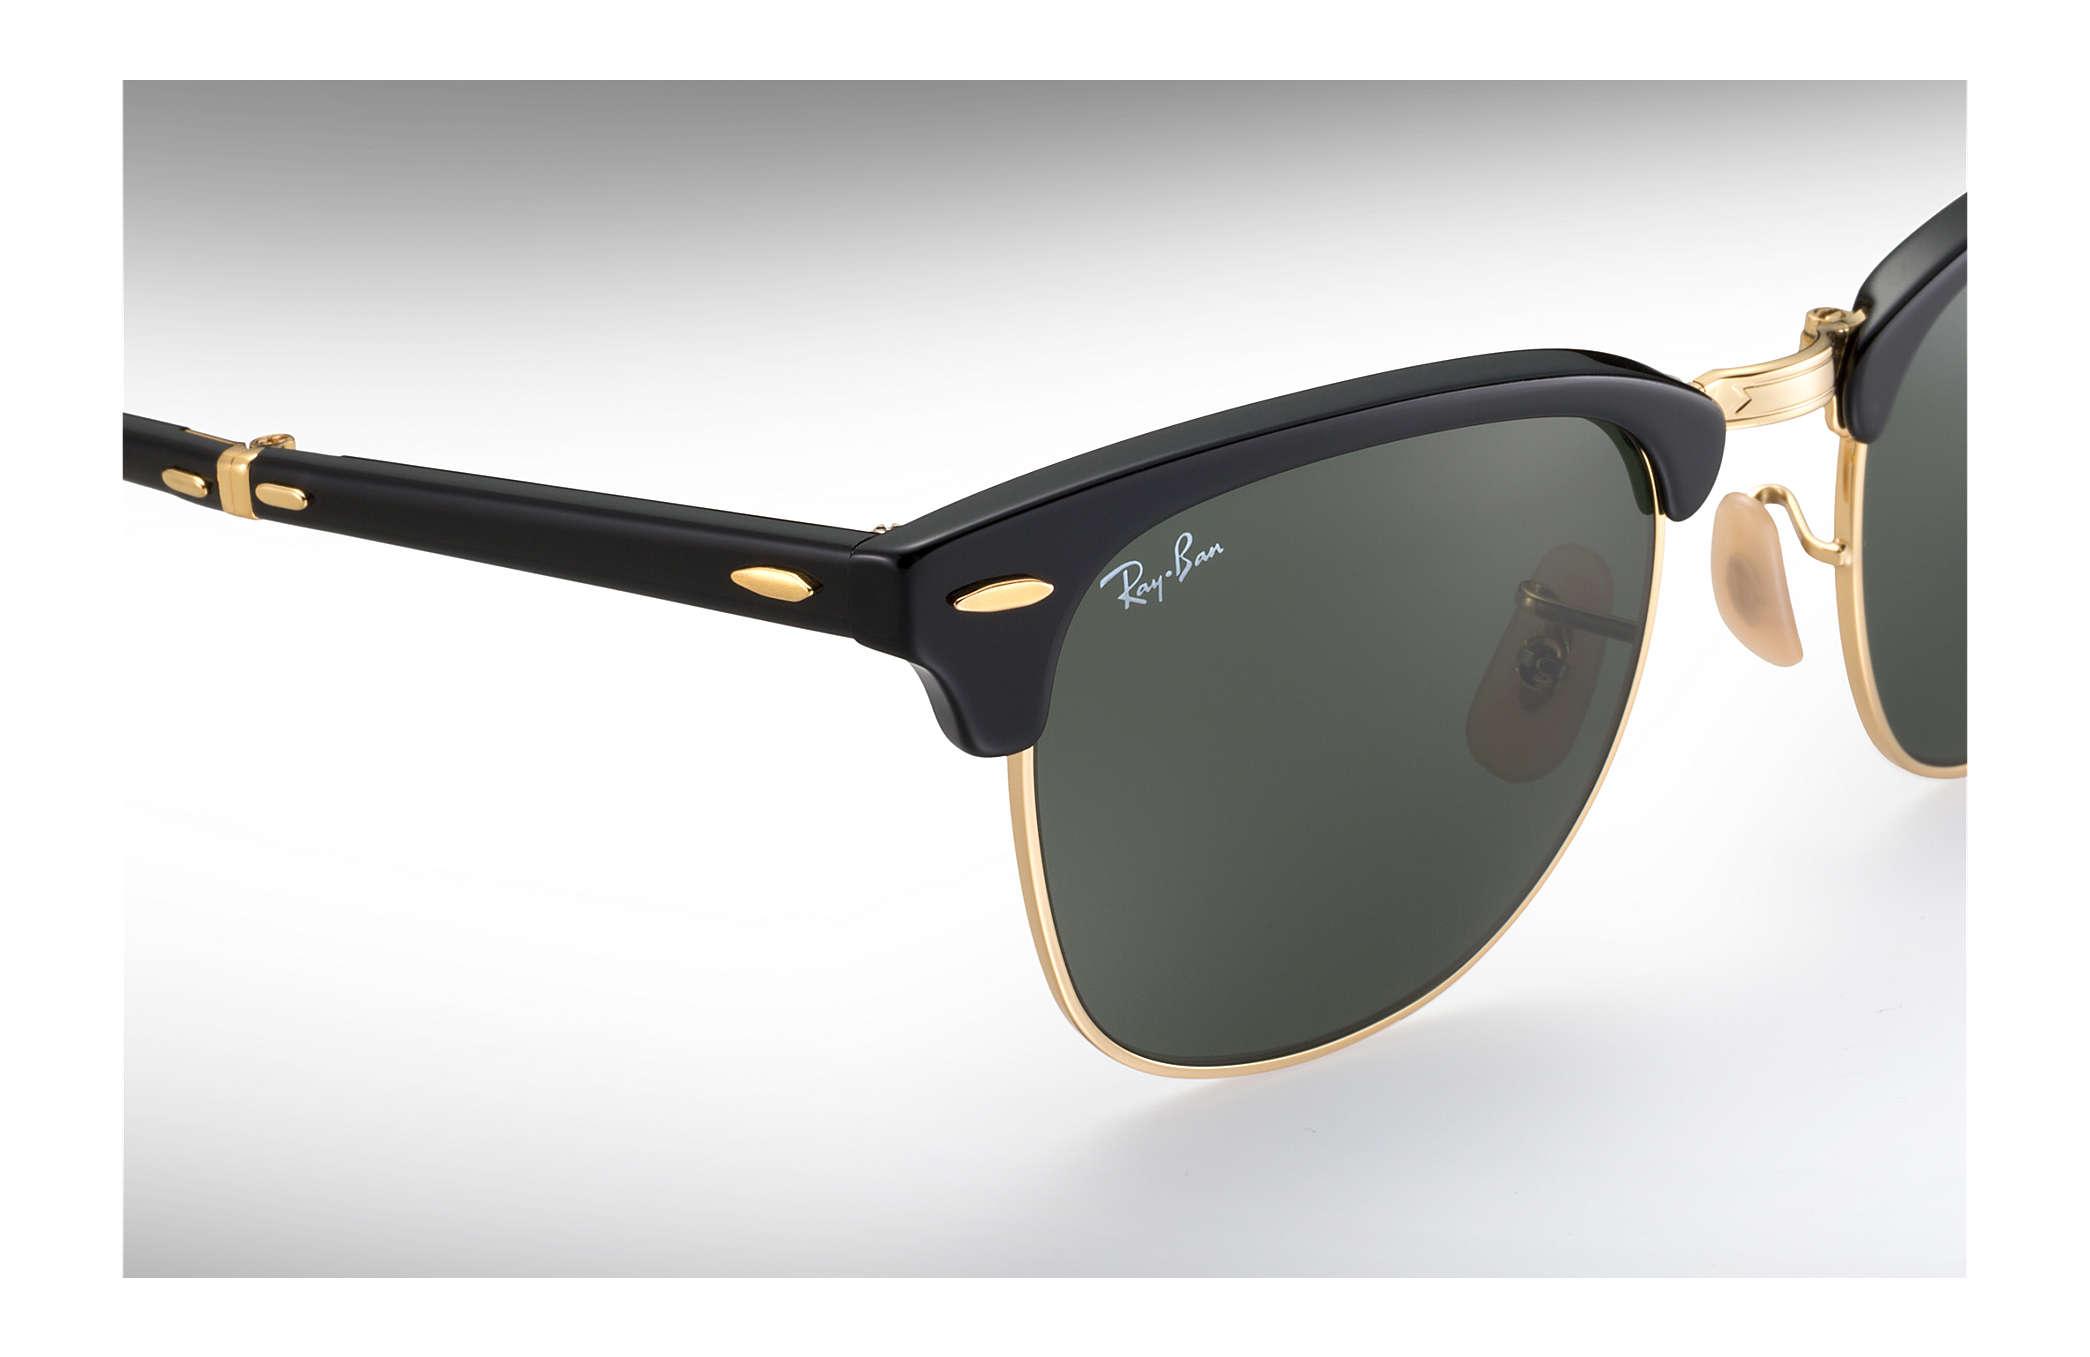 2c08783b3d71 Where To Buy Ray Ban Sunglasses In Australia